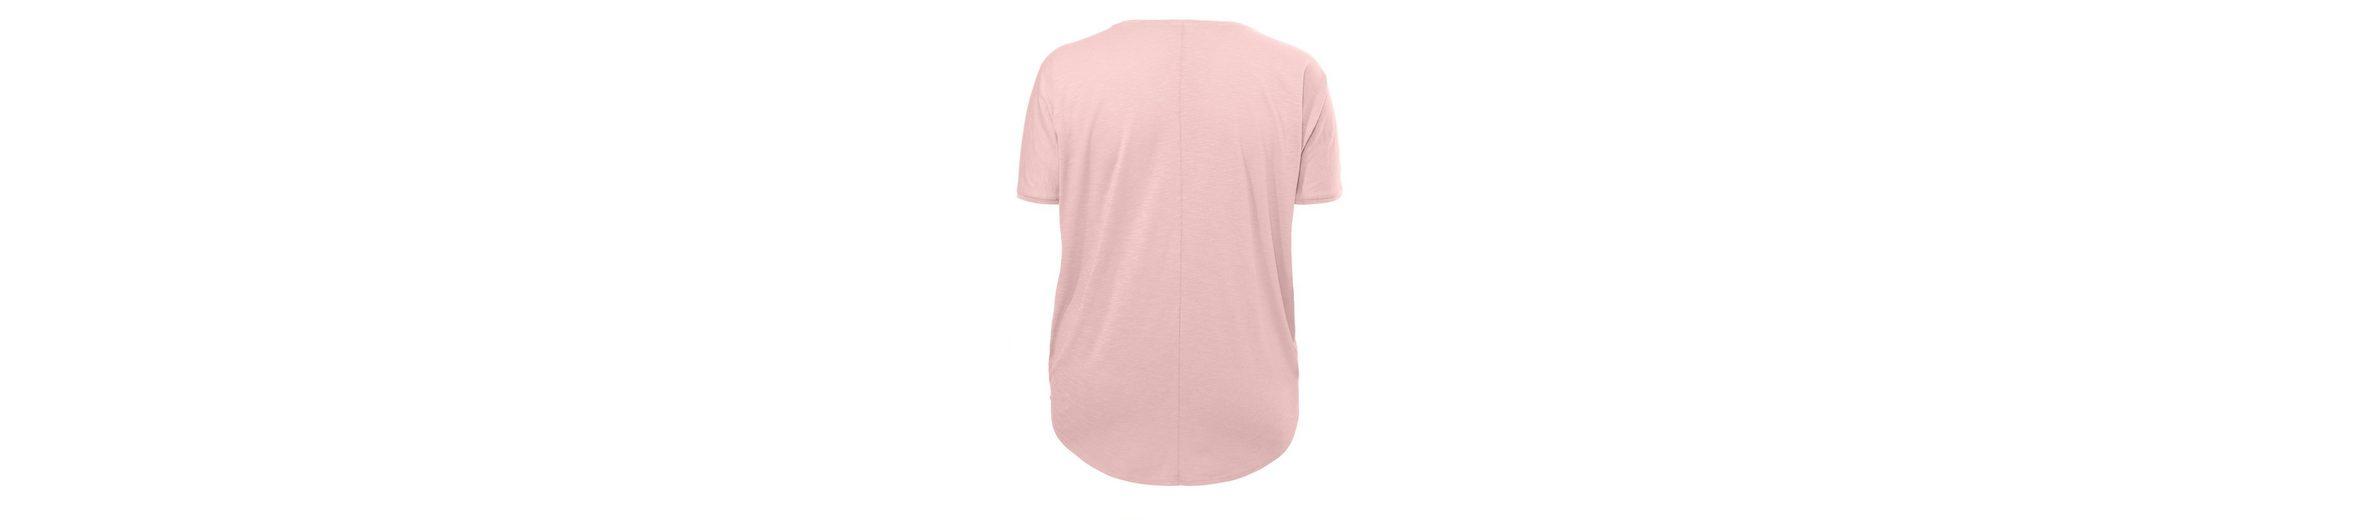 FRAPP Raffiniertes Shirt in V-Form